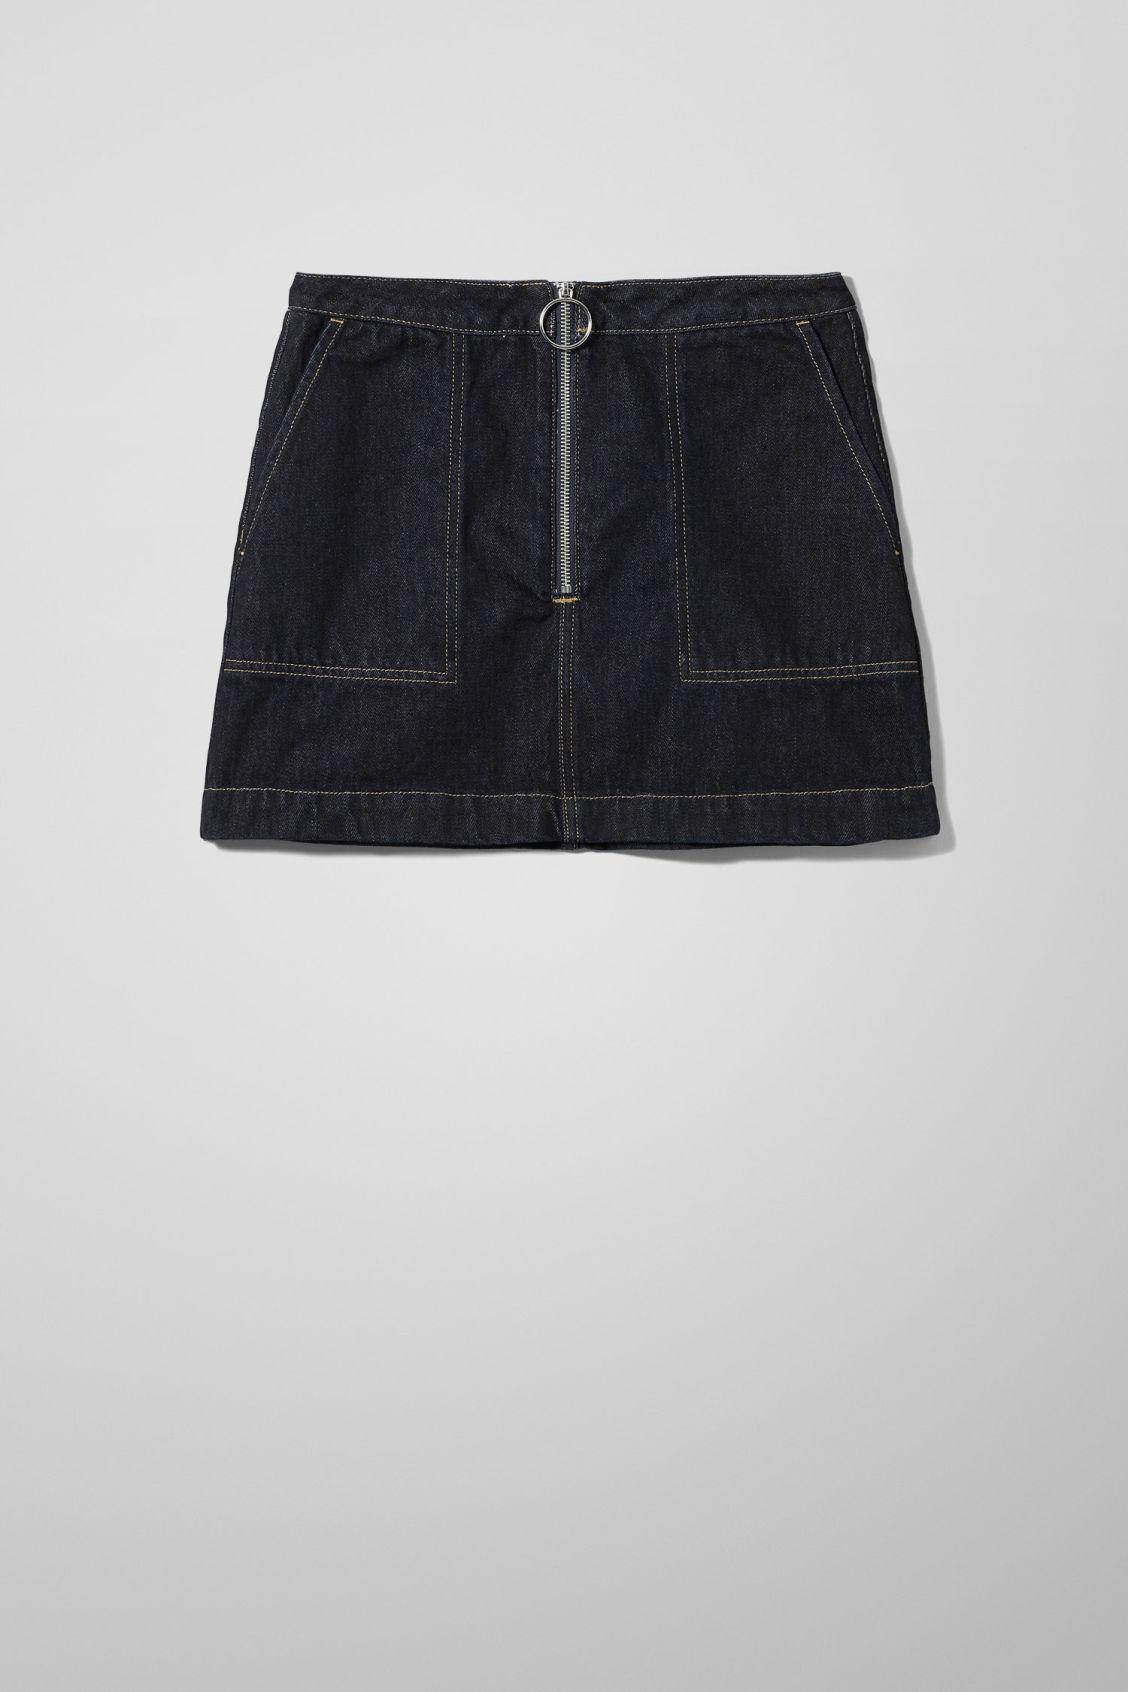 Piet Rinse Denim Mini Skirt - Blue